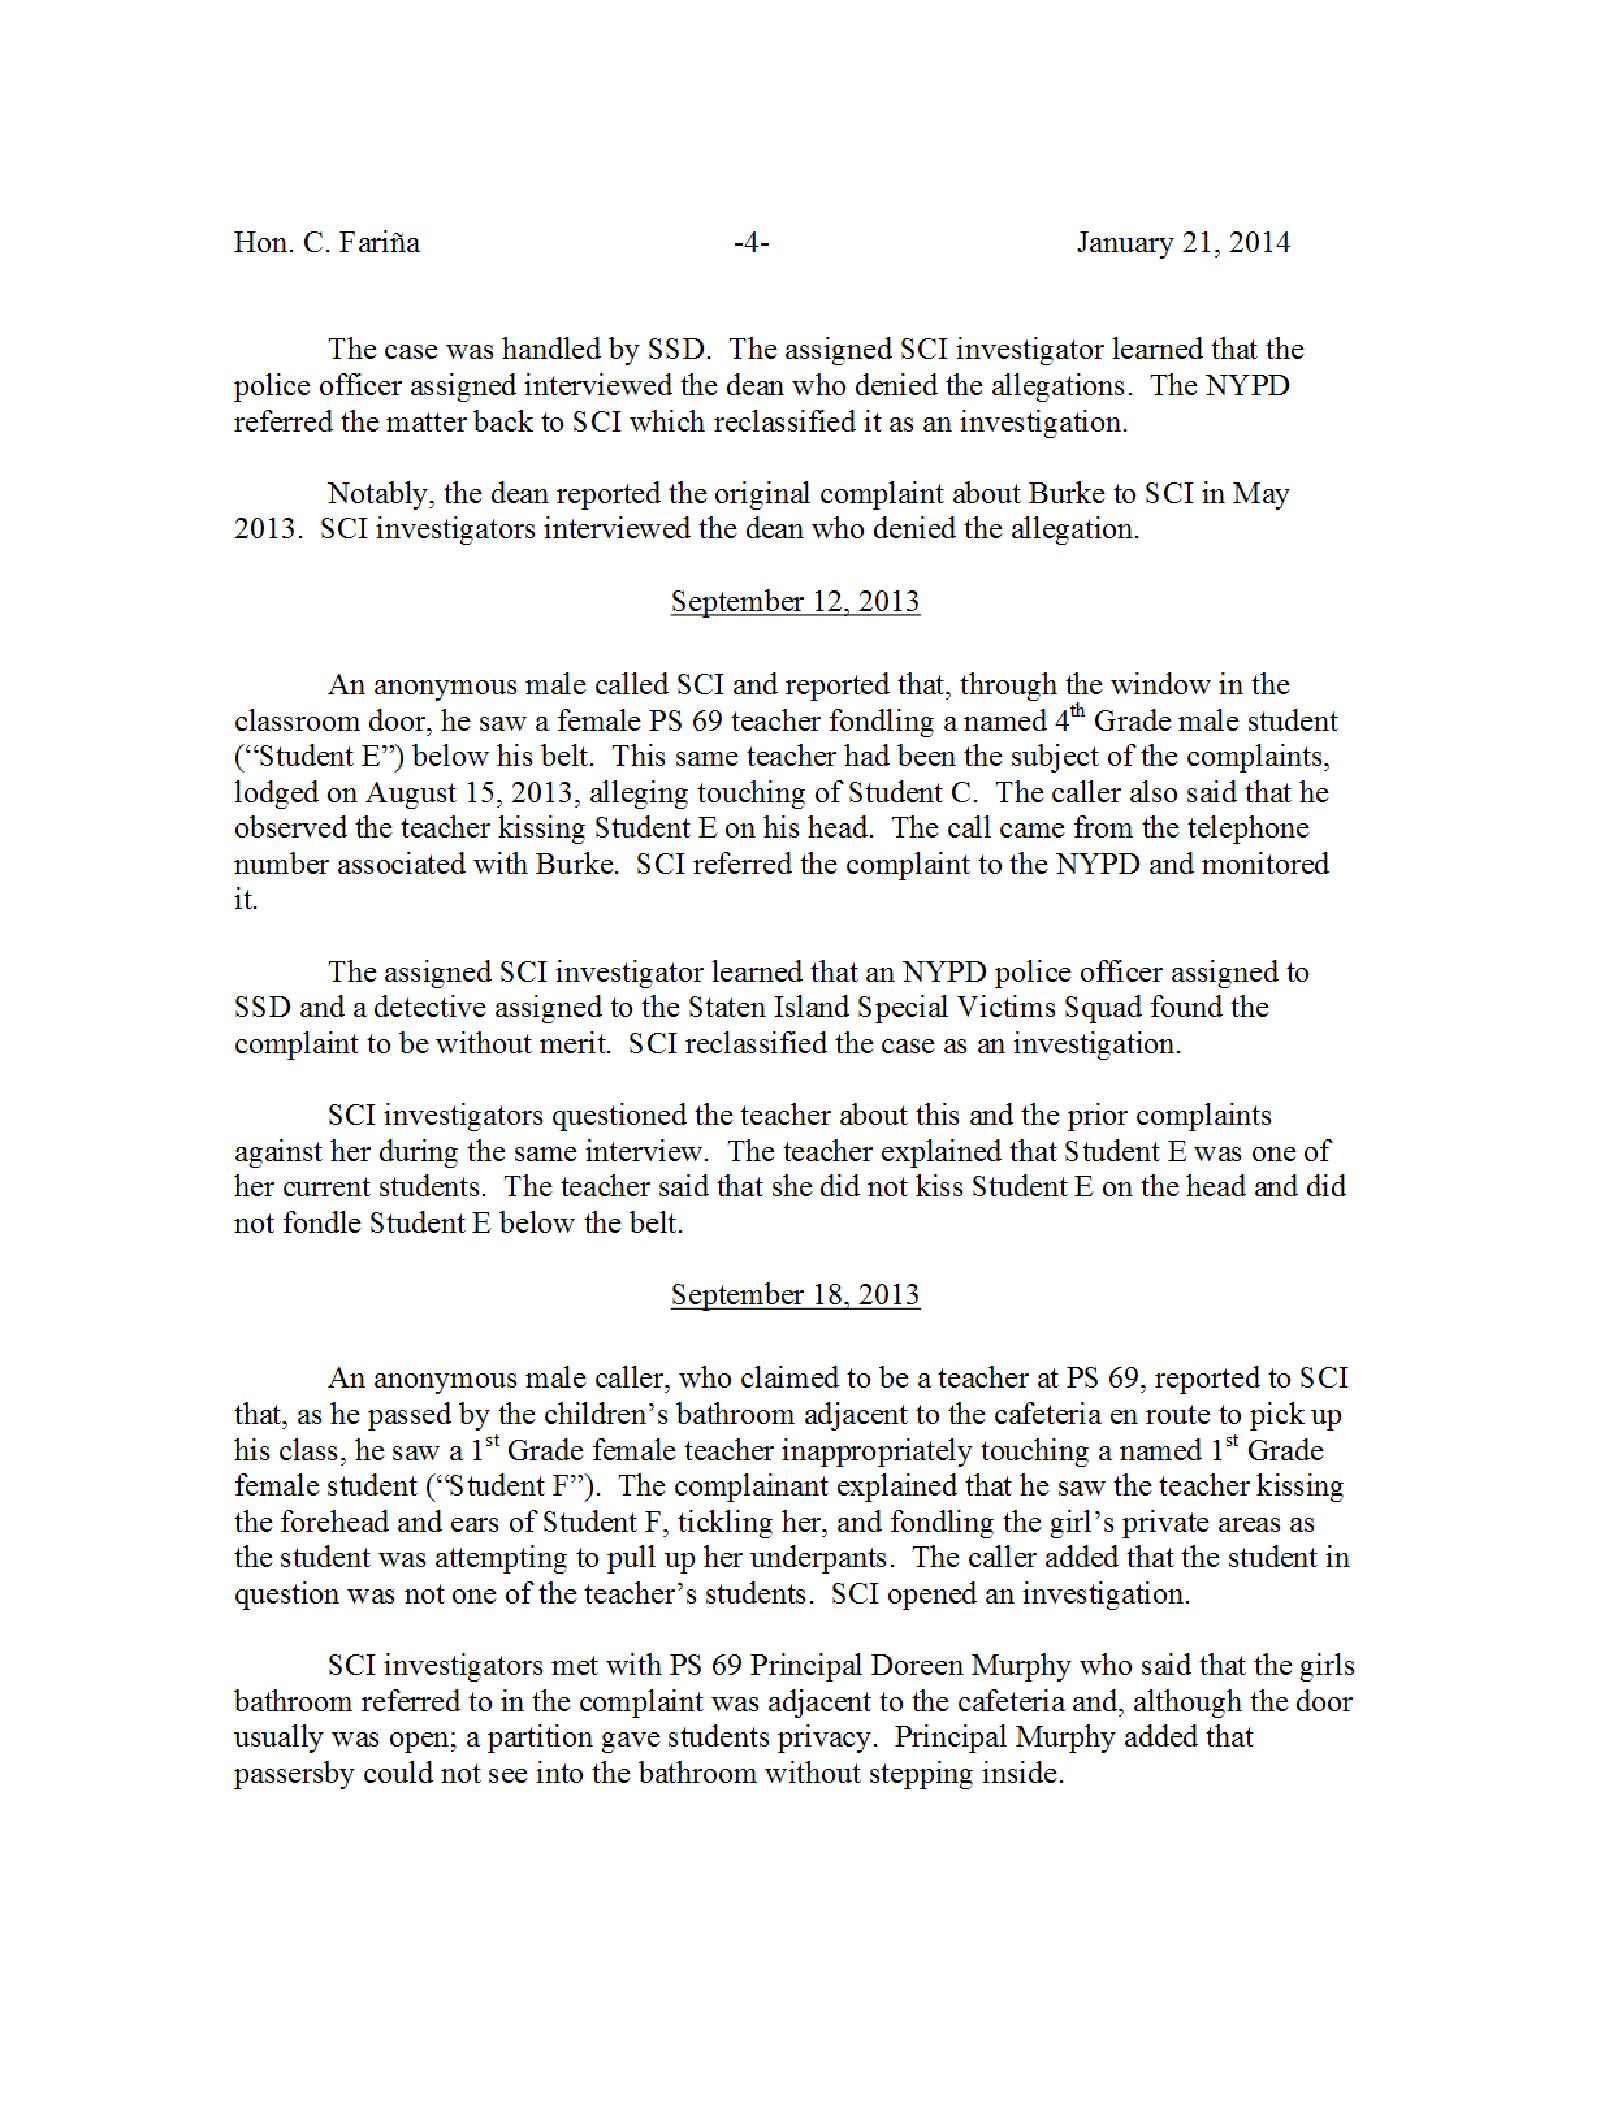 Copy of 1-22-2014 9-25-02 AM04.png